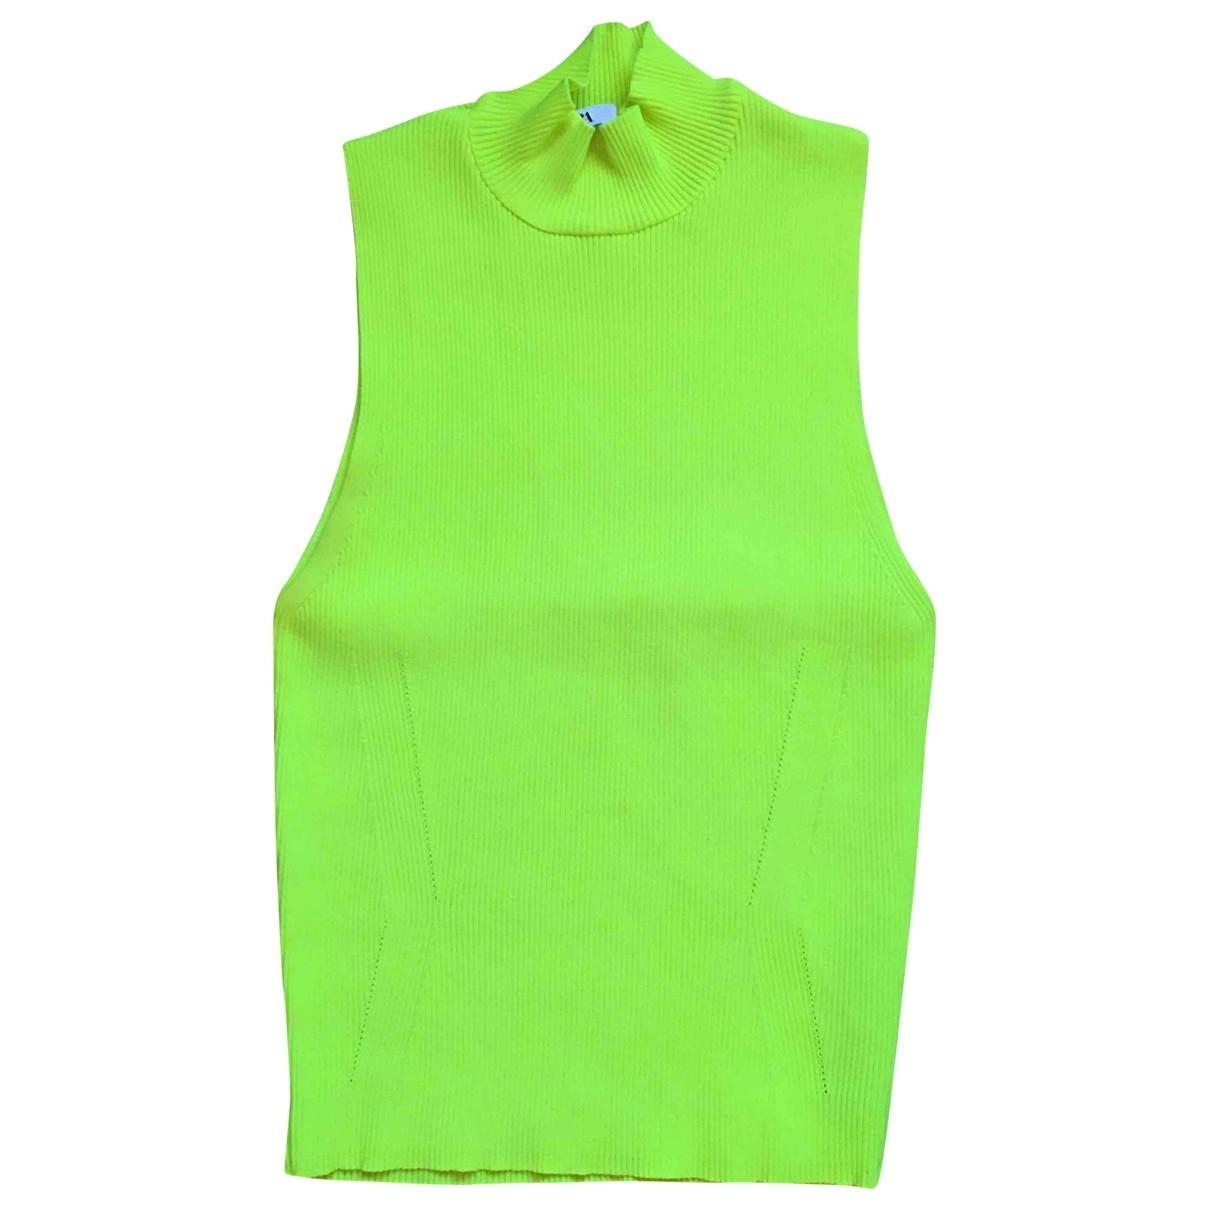 Zara \N Yellow  top for Women M International